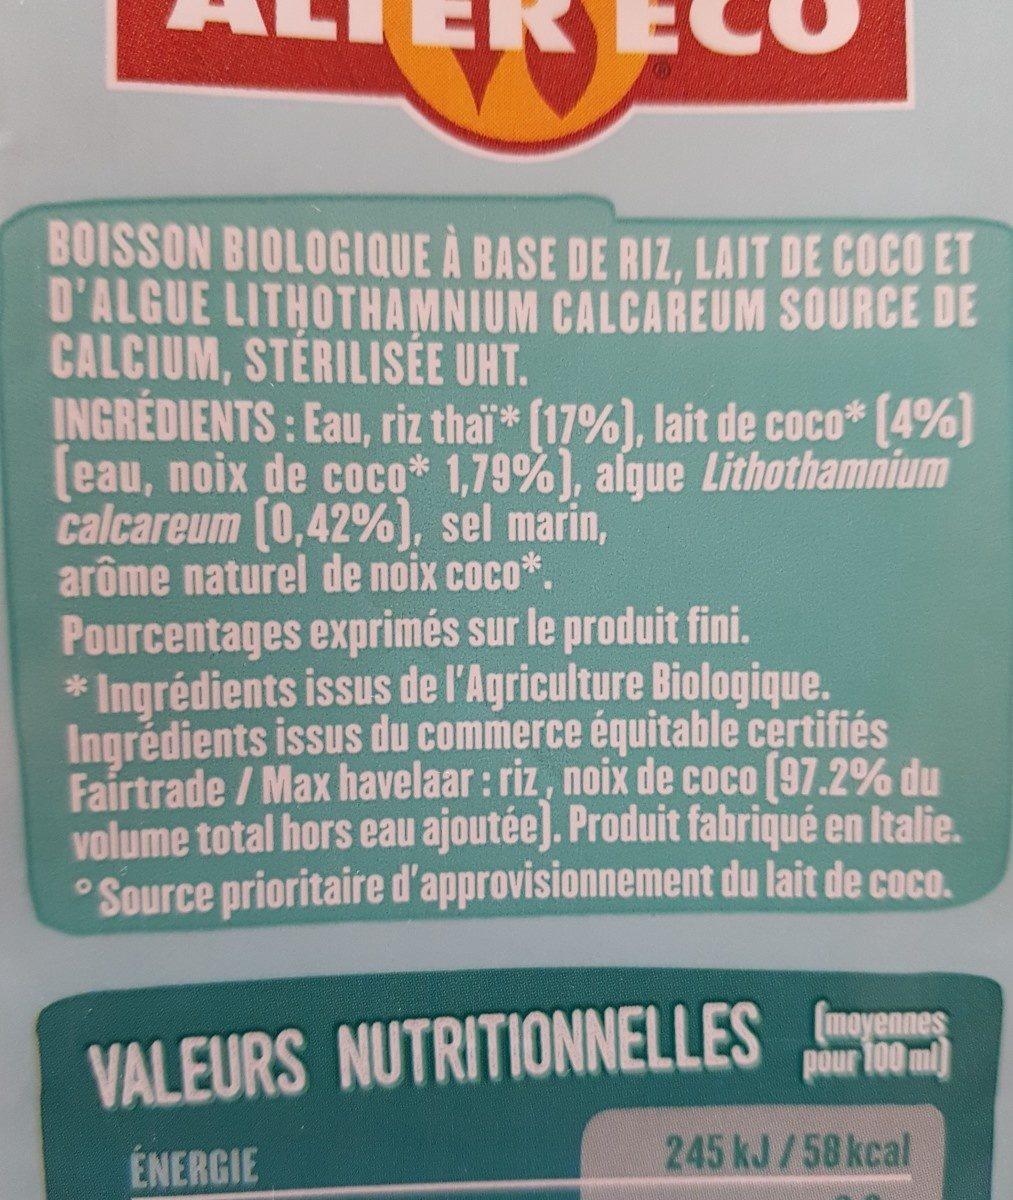 Boisson riz coco - Ingrédients - fr